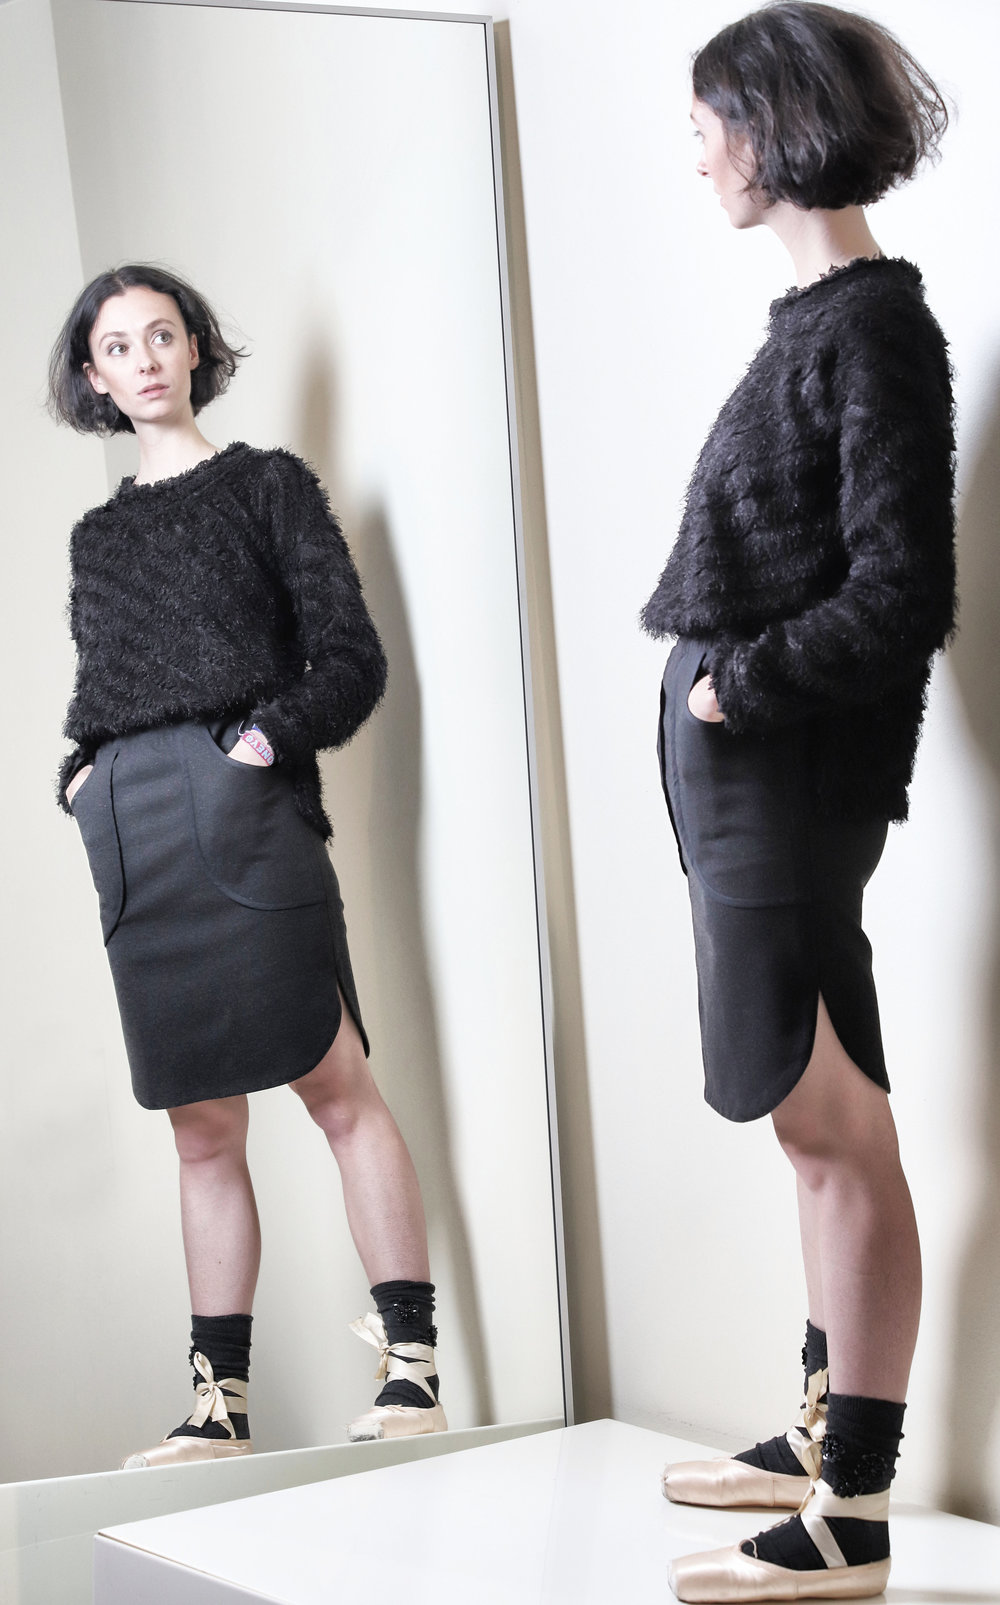 ©_Marie_Preaud_5190_.jpg-fashion_fotografie.jpg